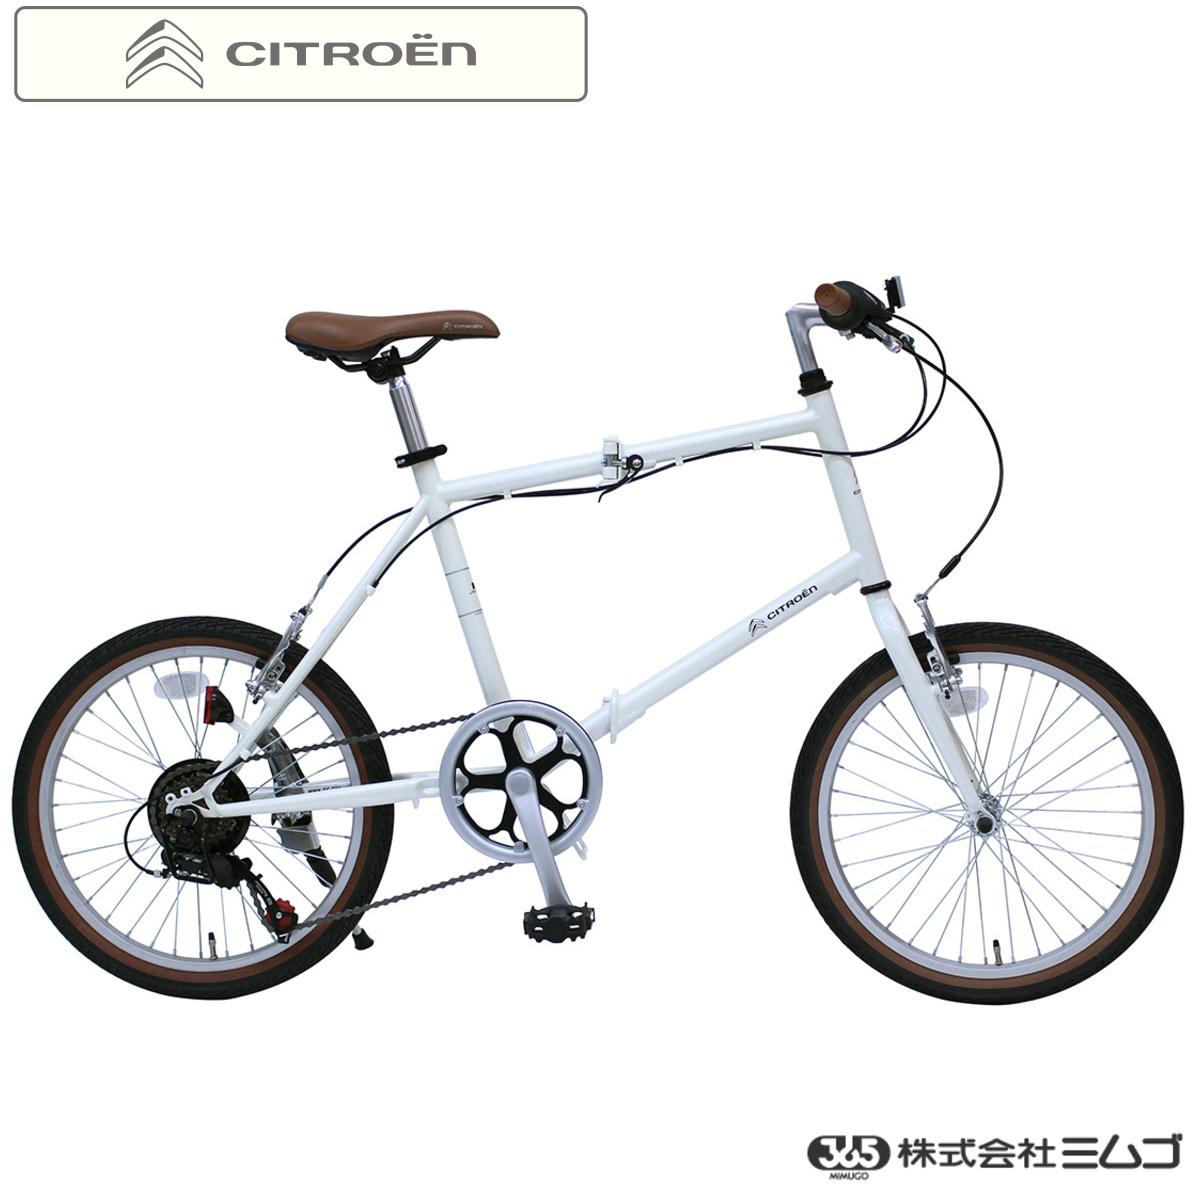 CITROEN FD-MINIVELO206SG シトロエン 20インチ ミニベロ MG-CTN206G 折り畳み自転車 ミムゴ 6段変速